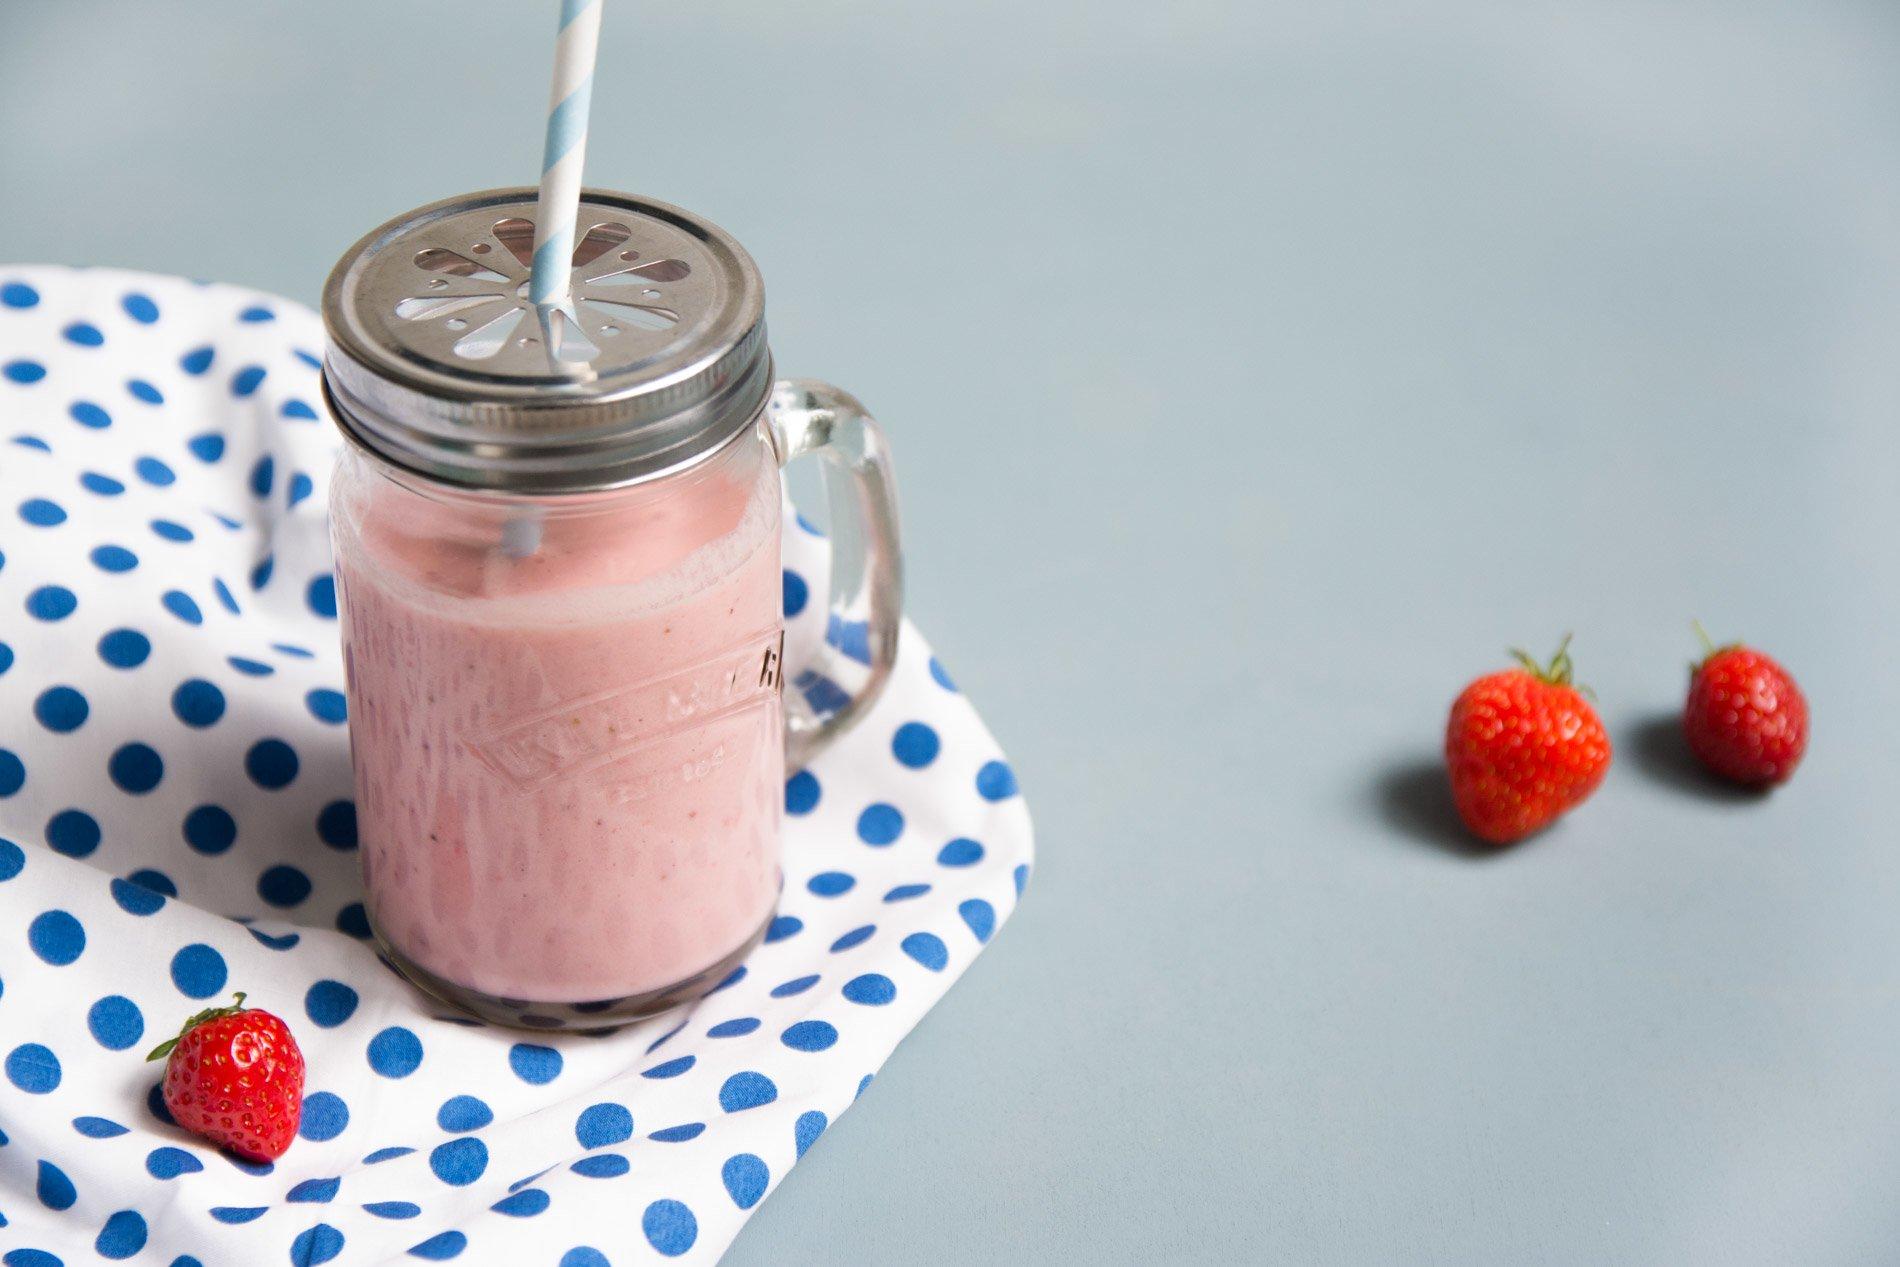 Milkshake à la fraise sans lactose - 22 v'la Scarlett